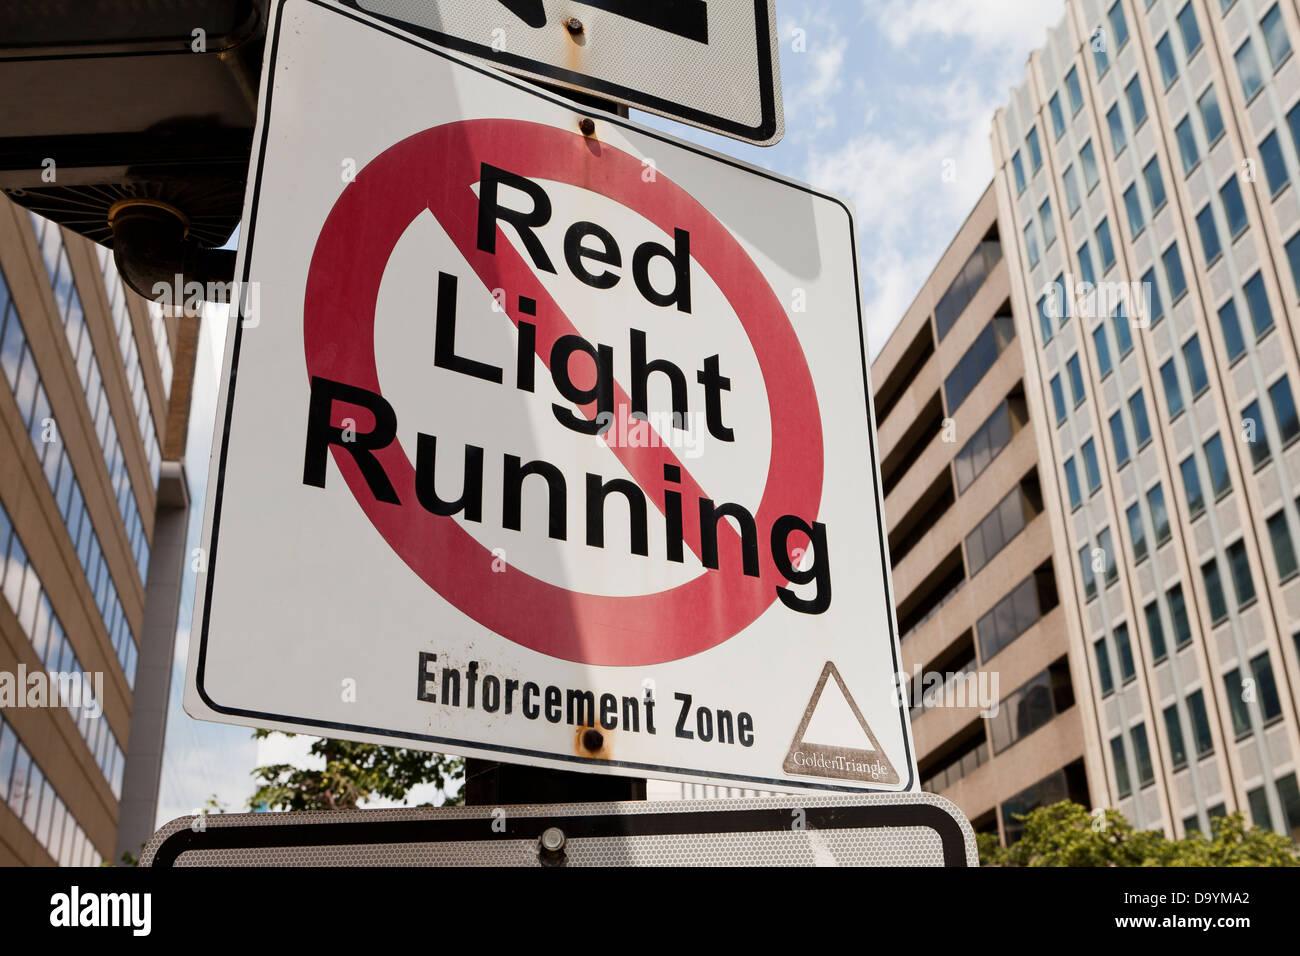 No red light running traffic sign - Stock Image